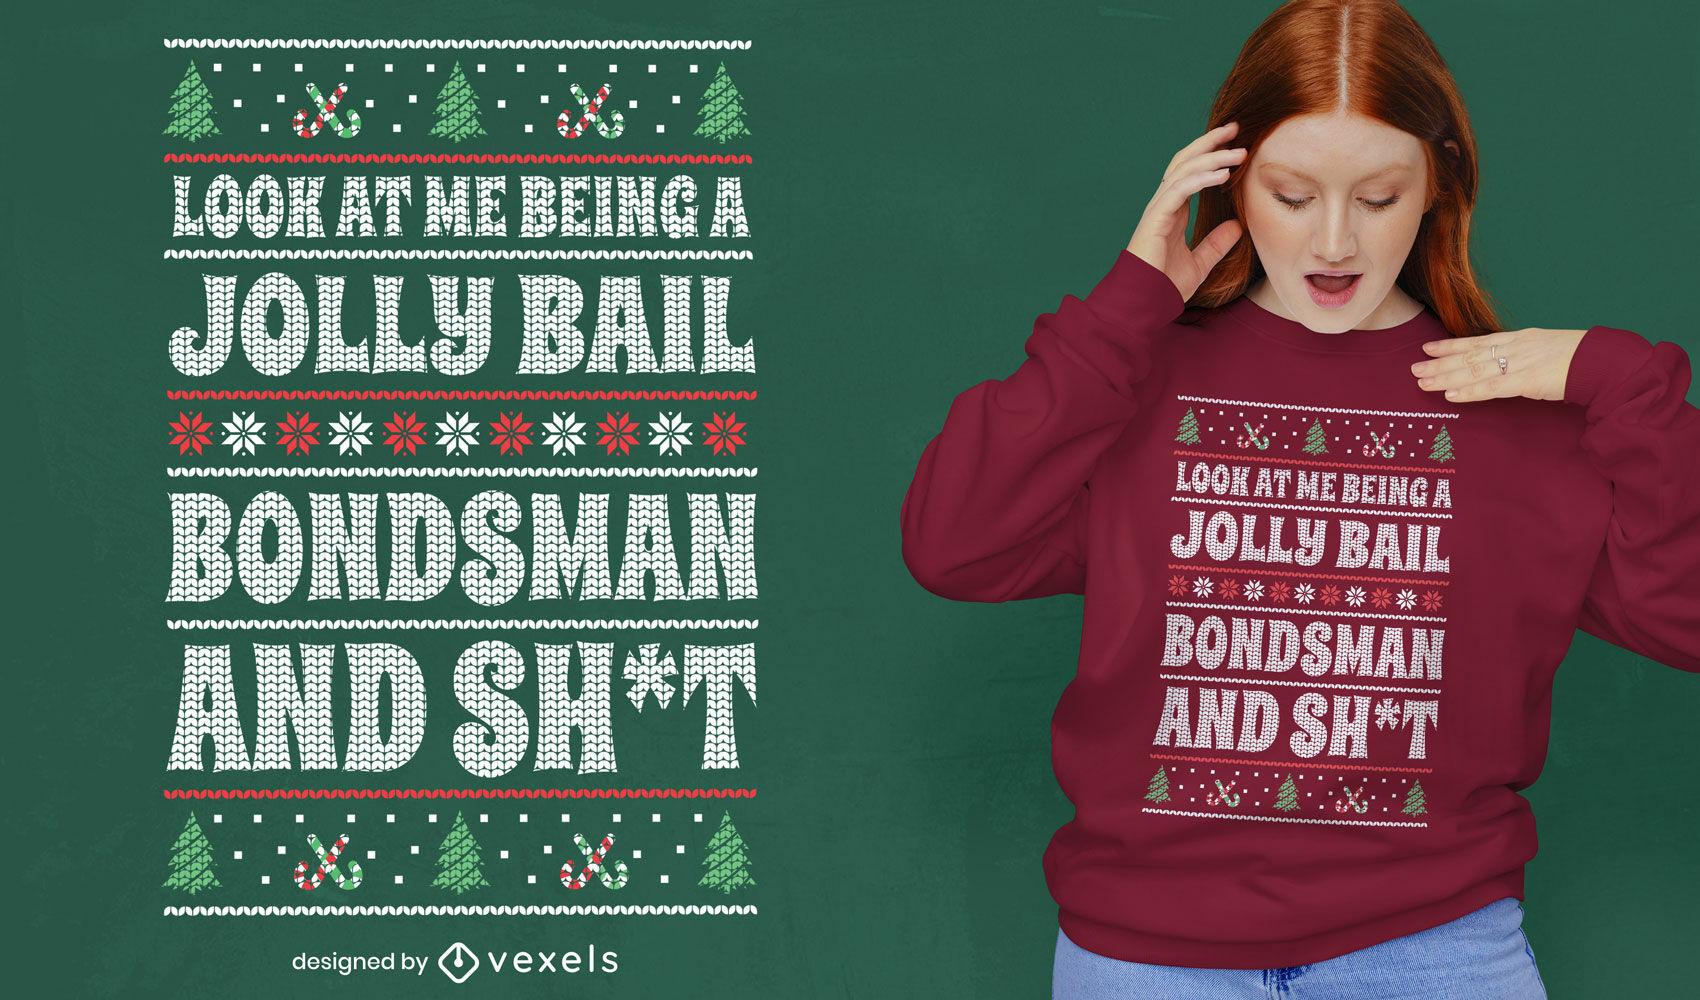 Divertido diseño de camiseta de suéter feo navideño.